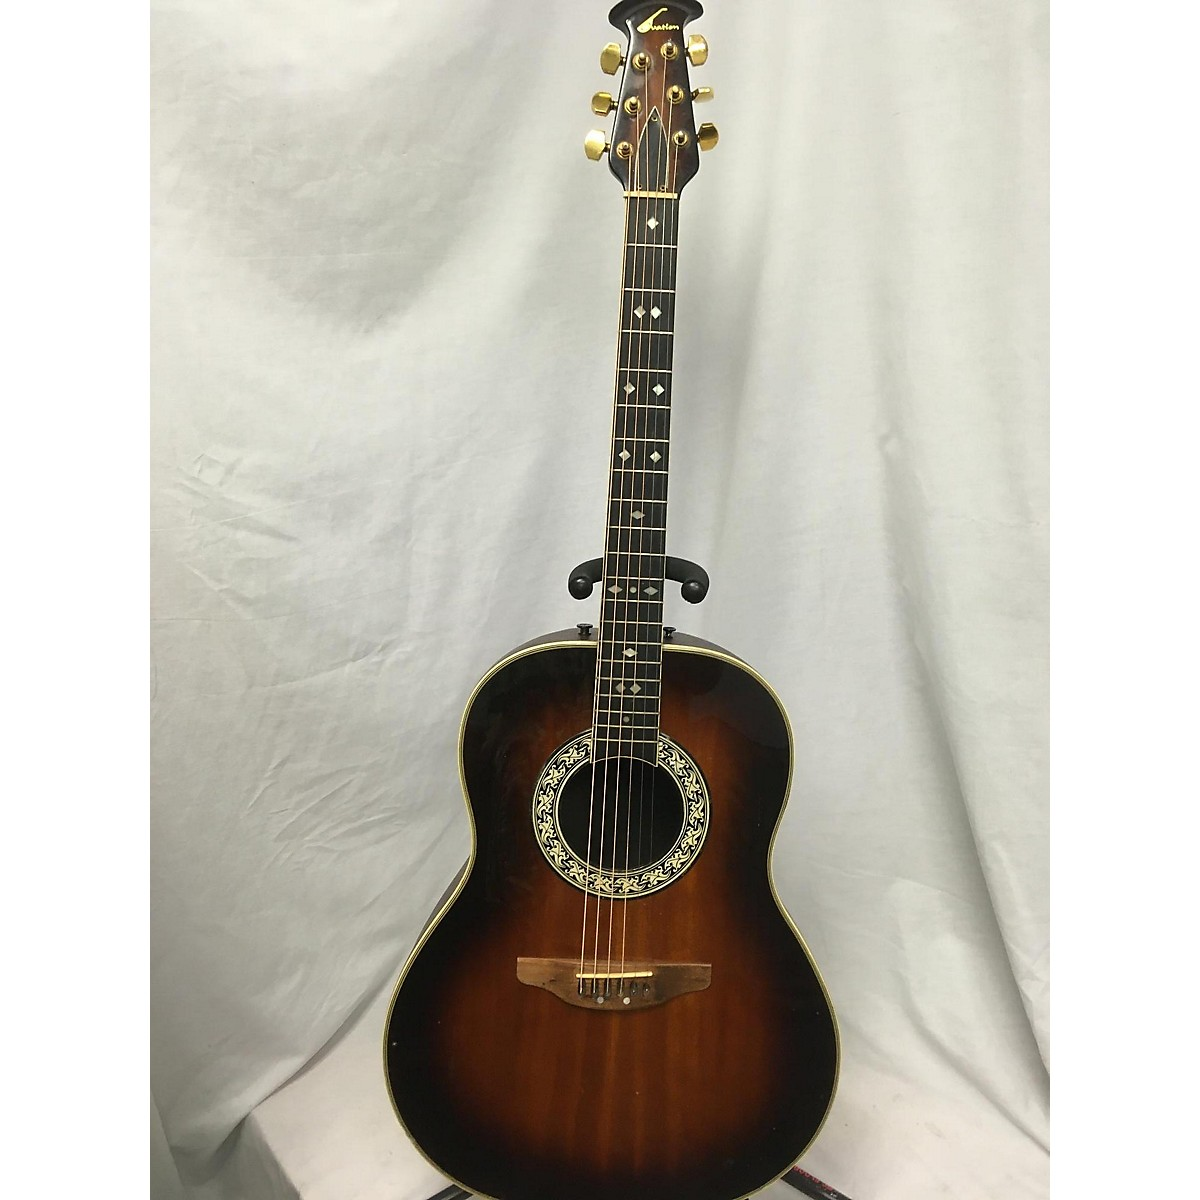 Ovation 1970s 1717 Acoustic Guitar